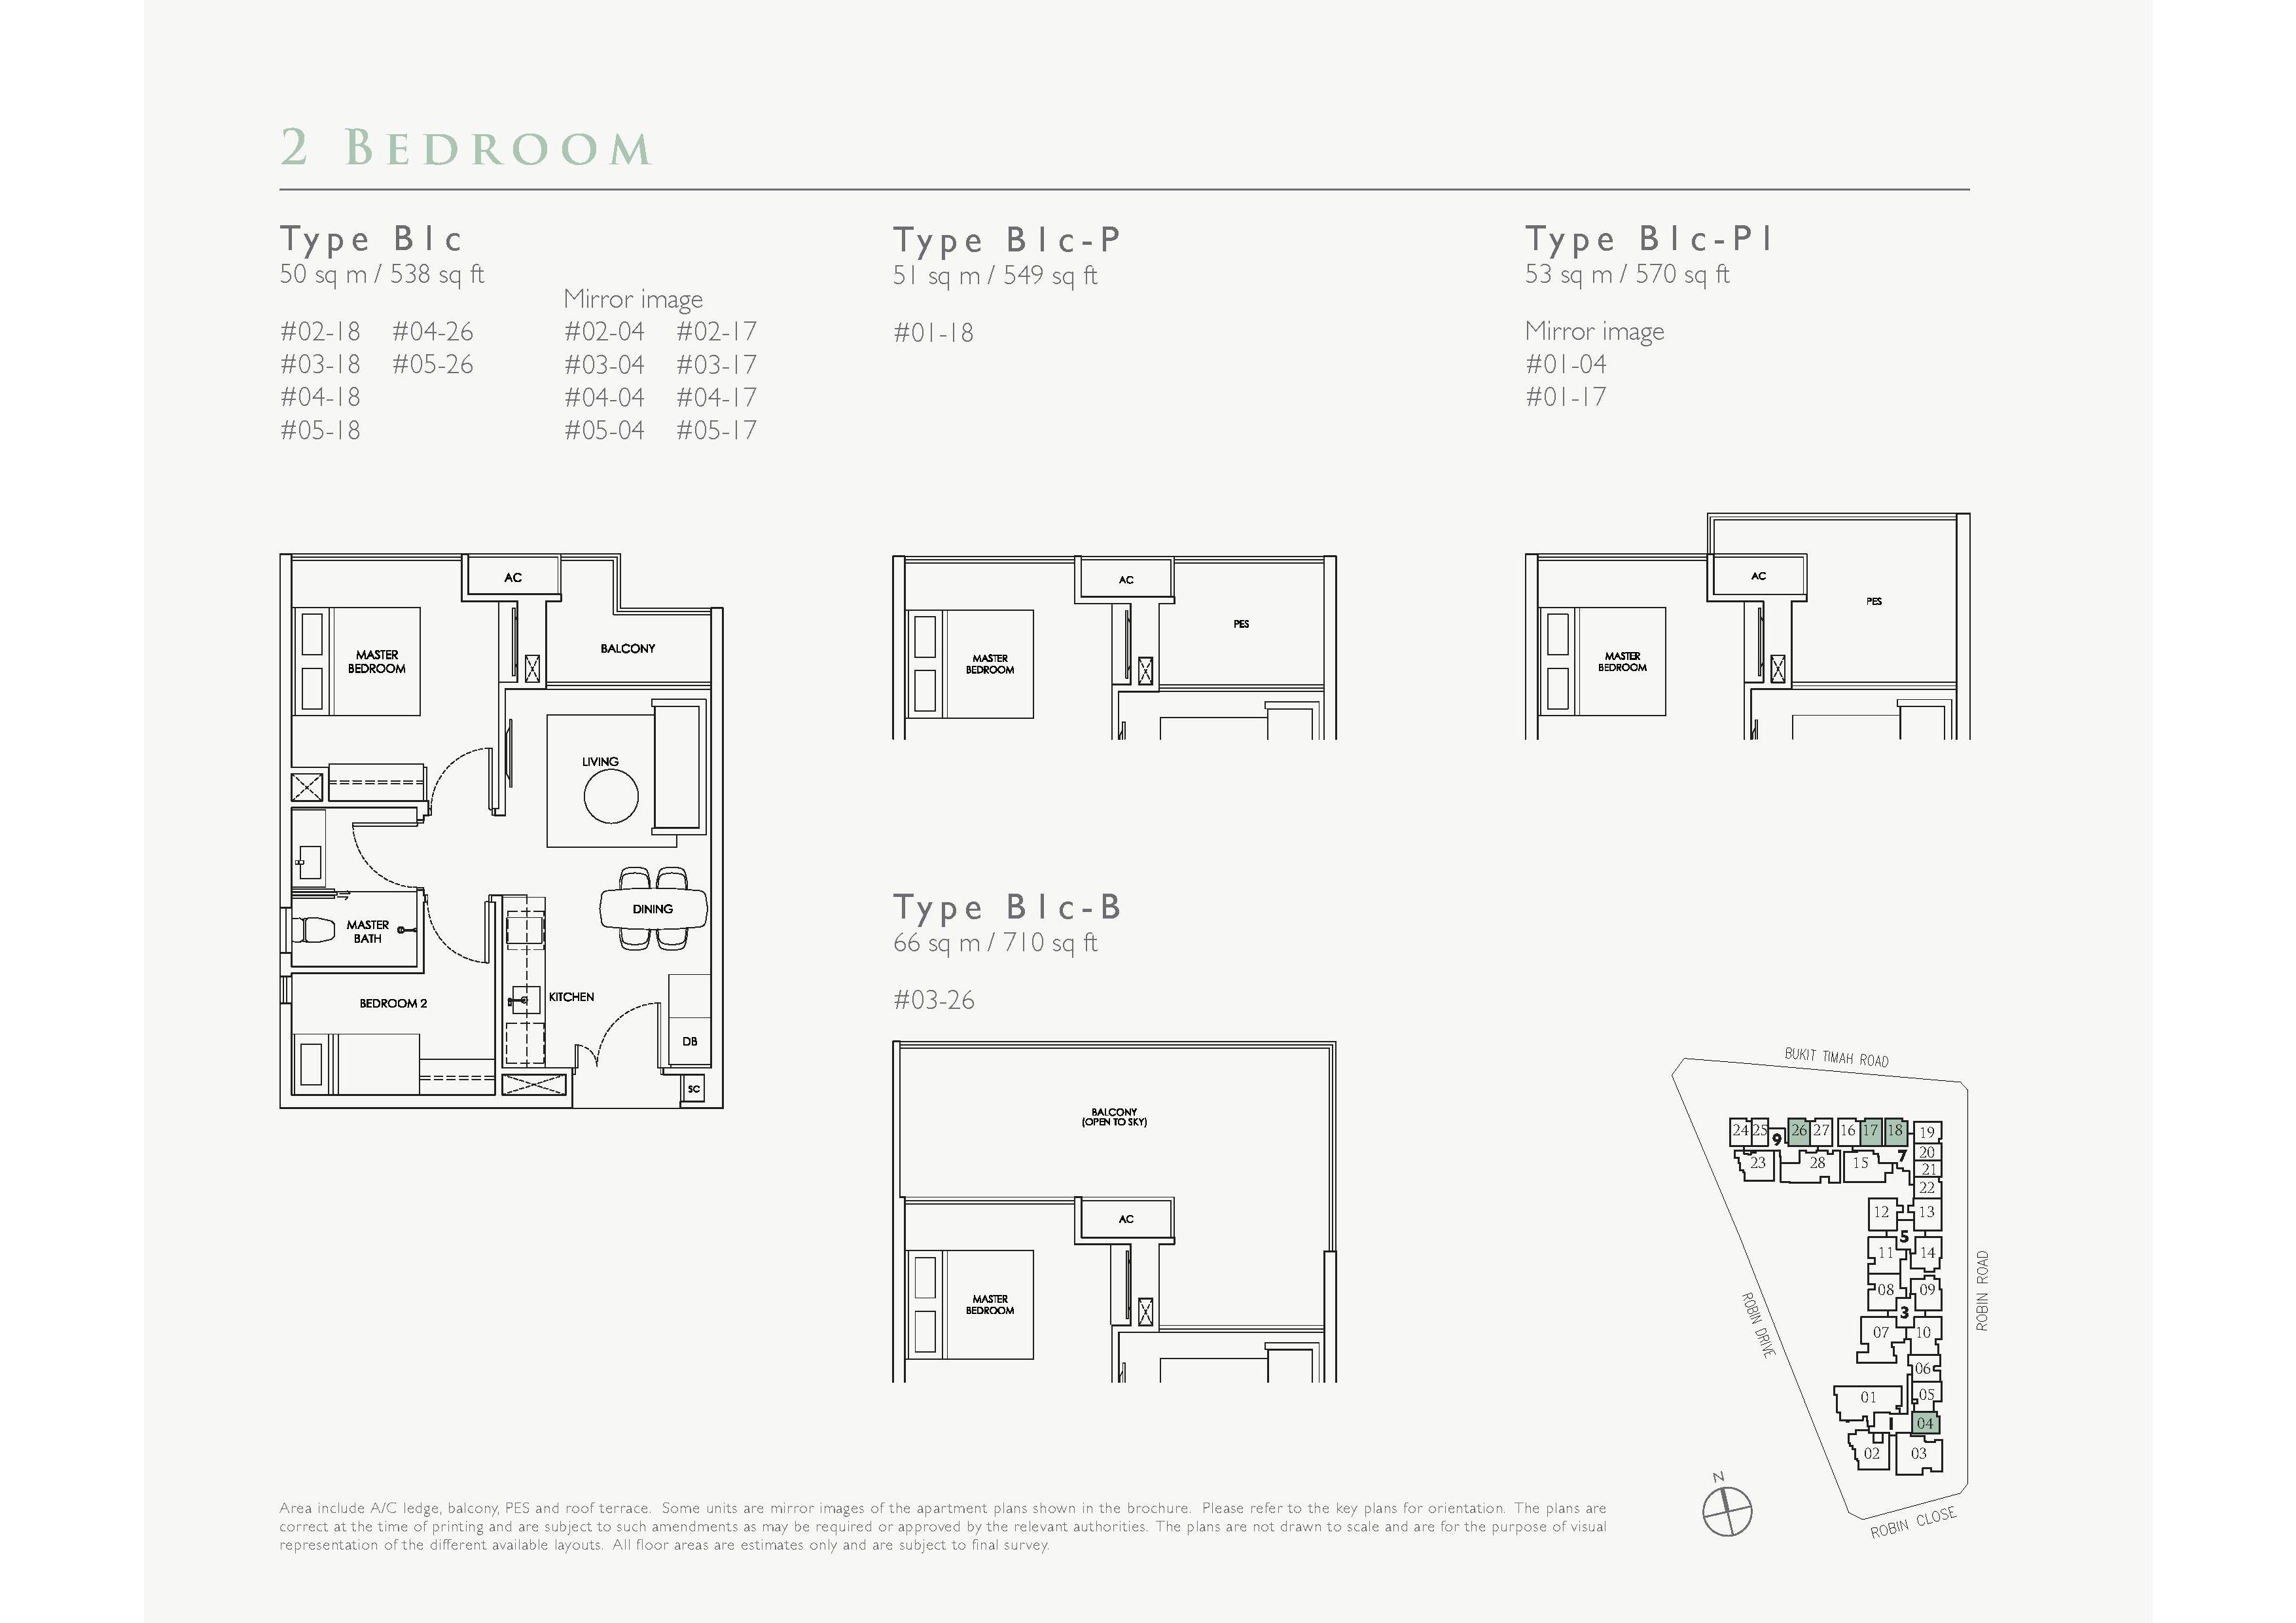 Robin Residences 2 Bedroom Floor Plans Type B1c, B1c-P, B1c-P1, B1c-B